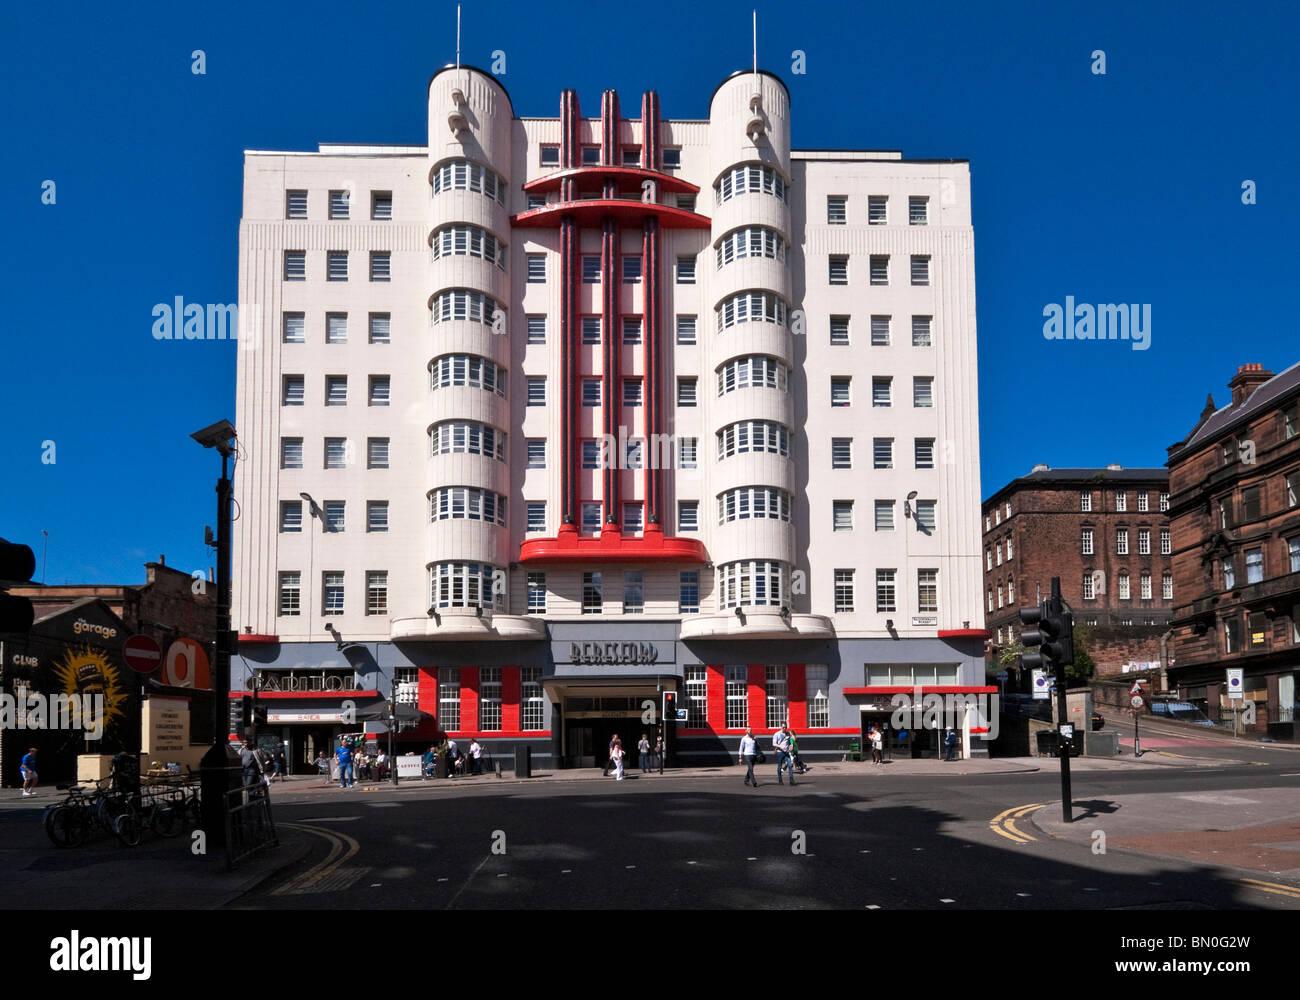 This Distinctive Art Deco Building In Sauchiehall Street